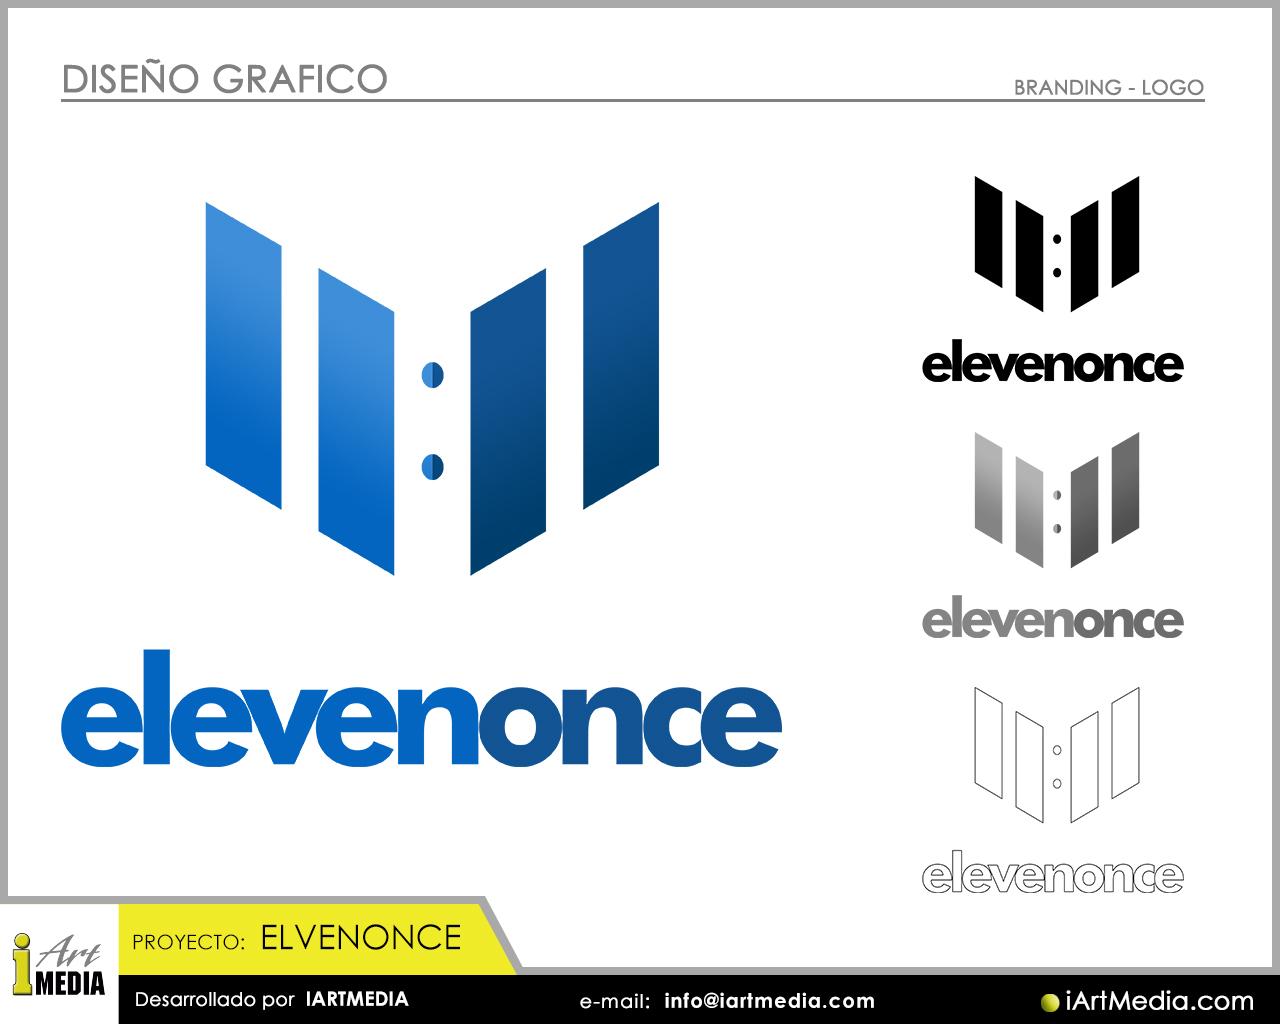 eleven_once_diseno